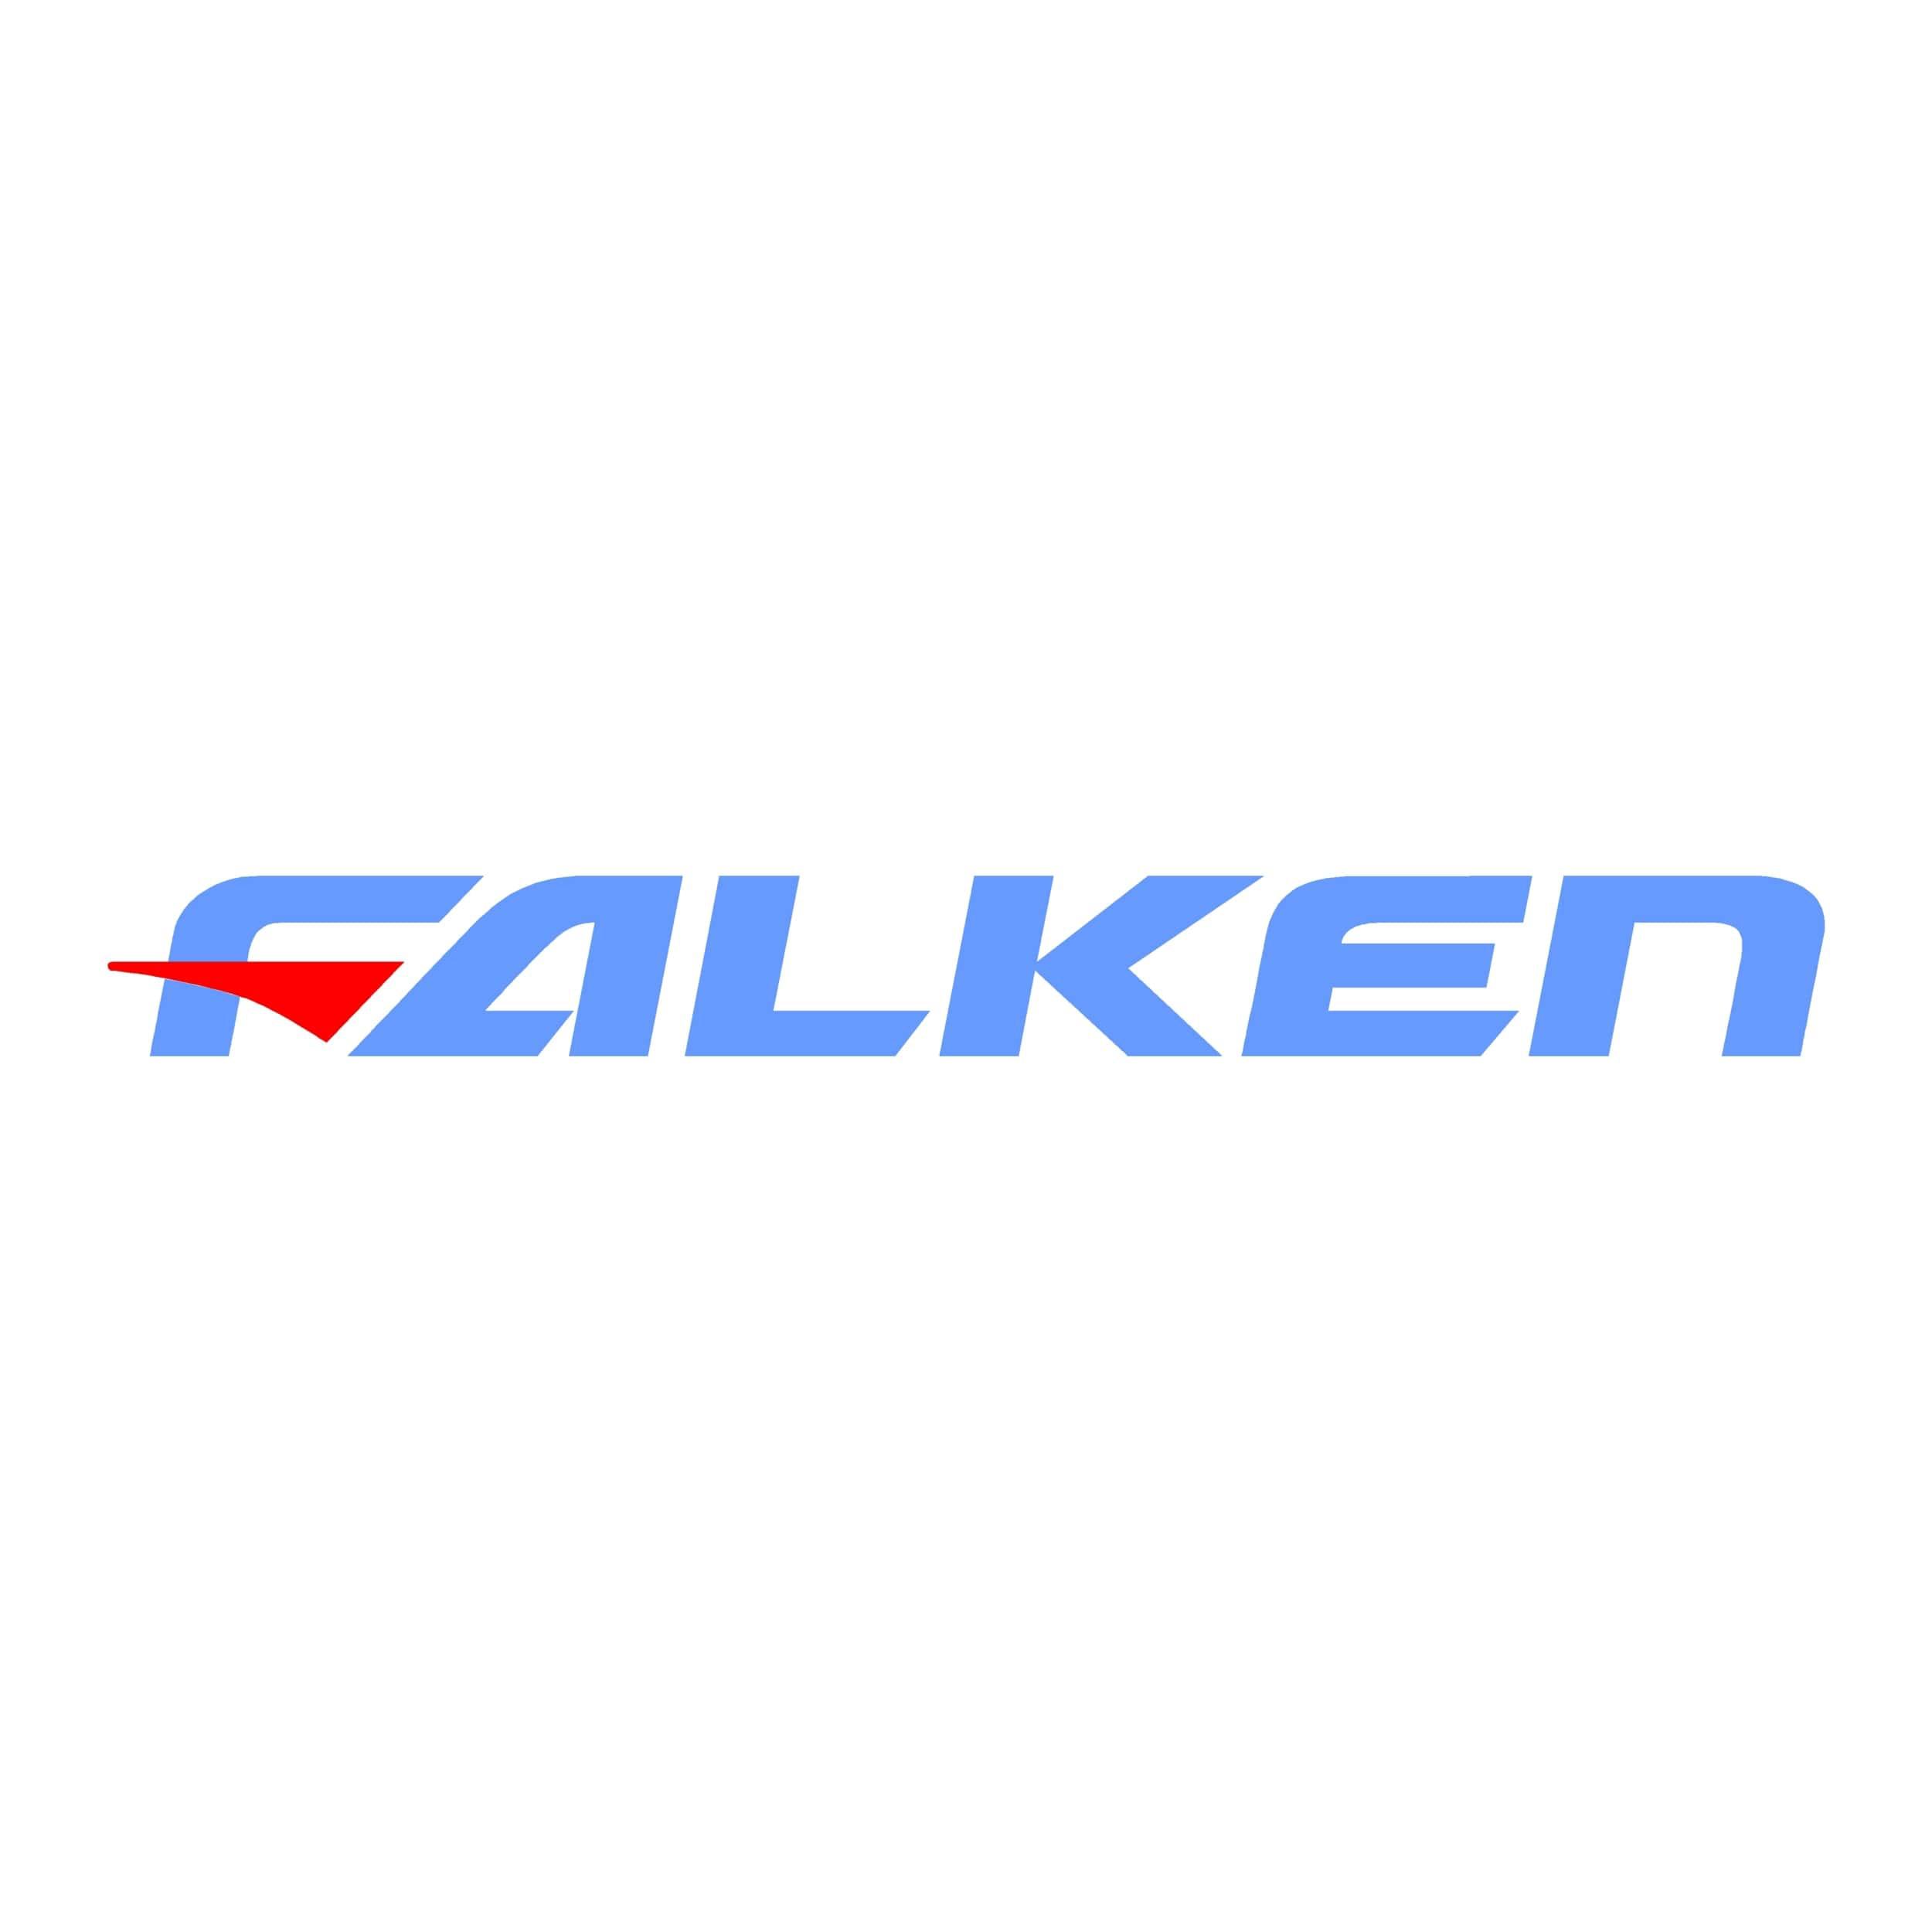 stickers-falken-ref-2-tuning-audio-sonorisation-car-auto-moto-camion-competition-deco-rallye-autocollant-min